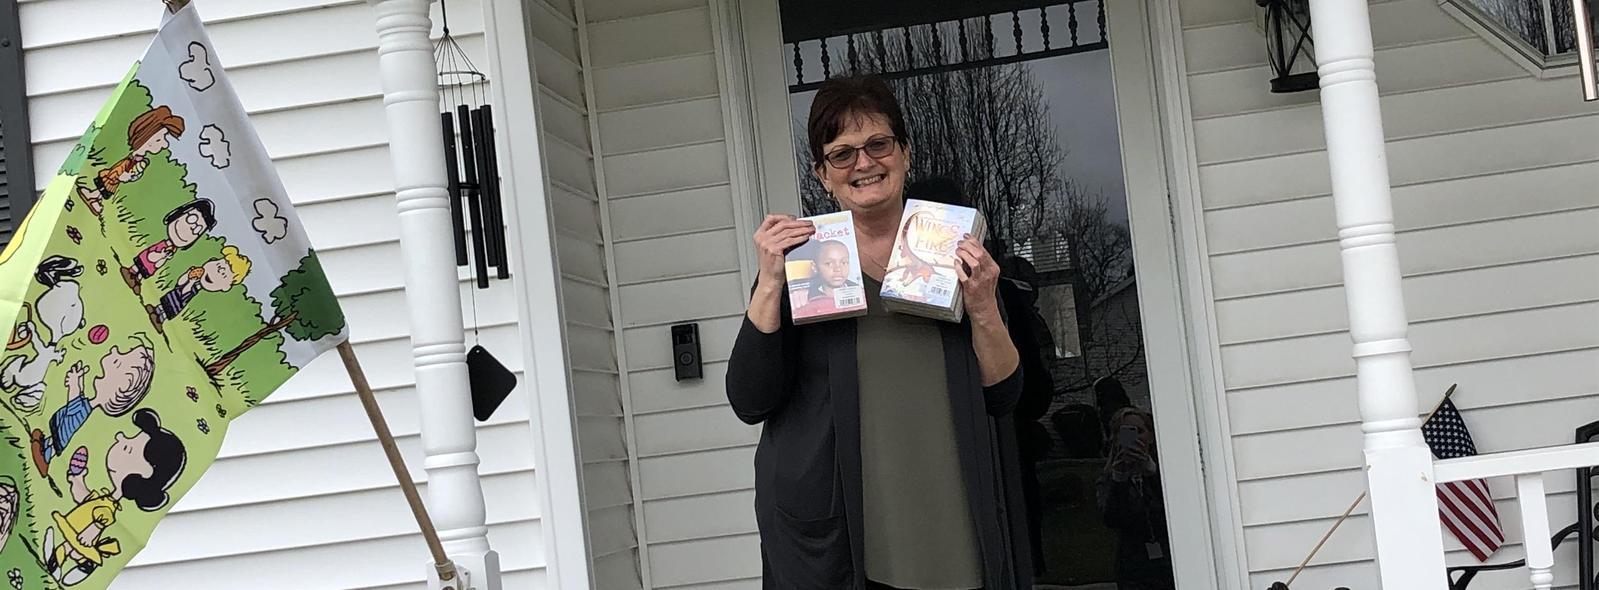 Mrs. David delivers books